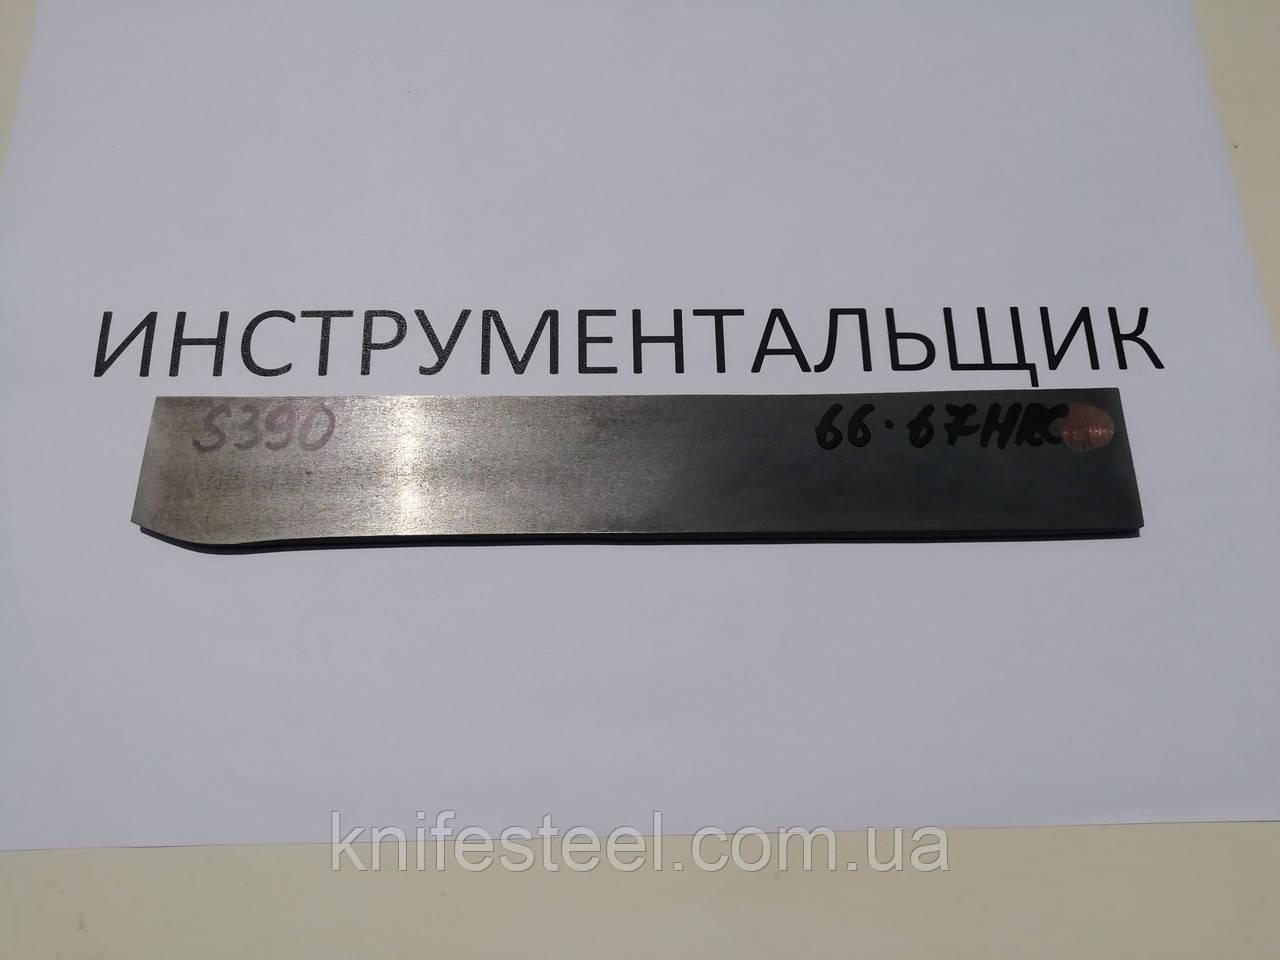 Заготовка для ножа сталь S390 210х34-35х4 мм термообработка (66-67 HRC)